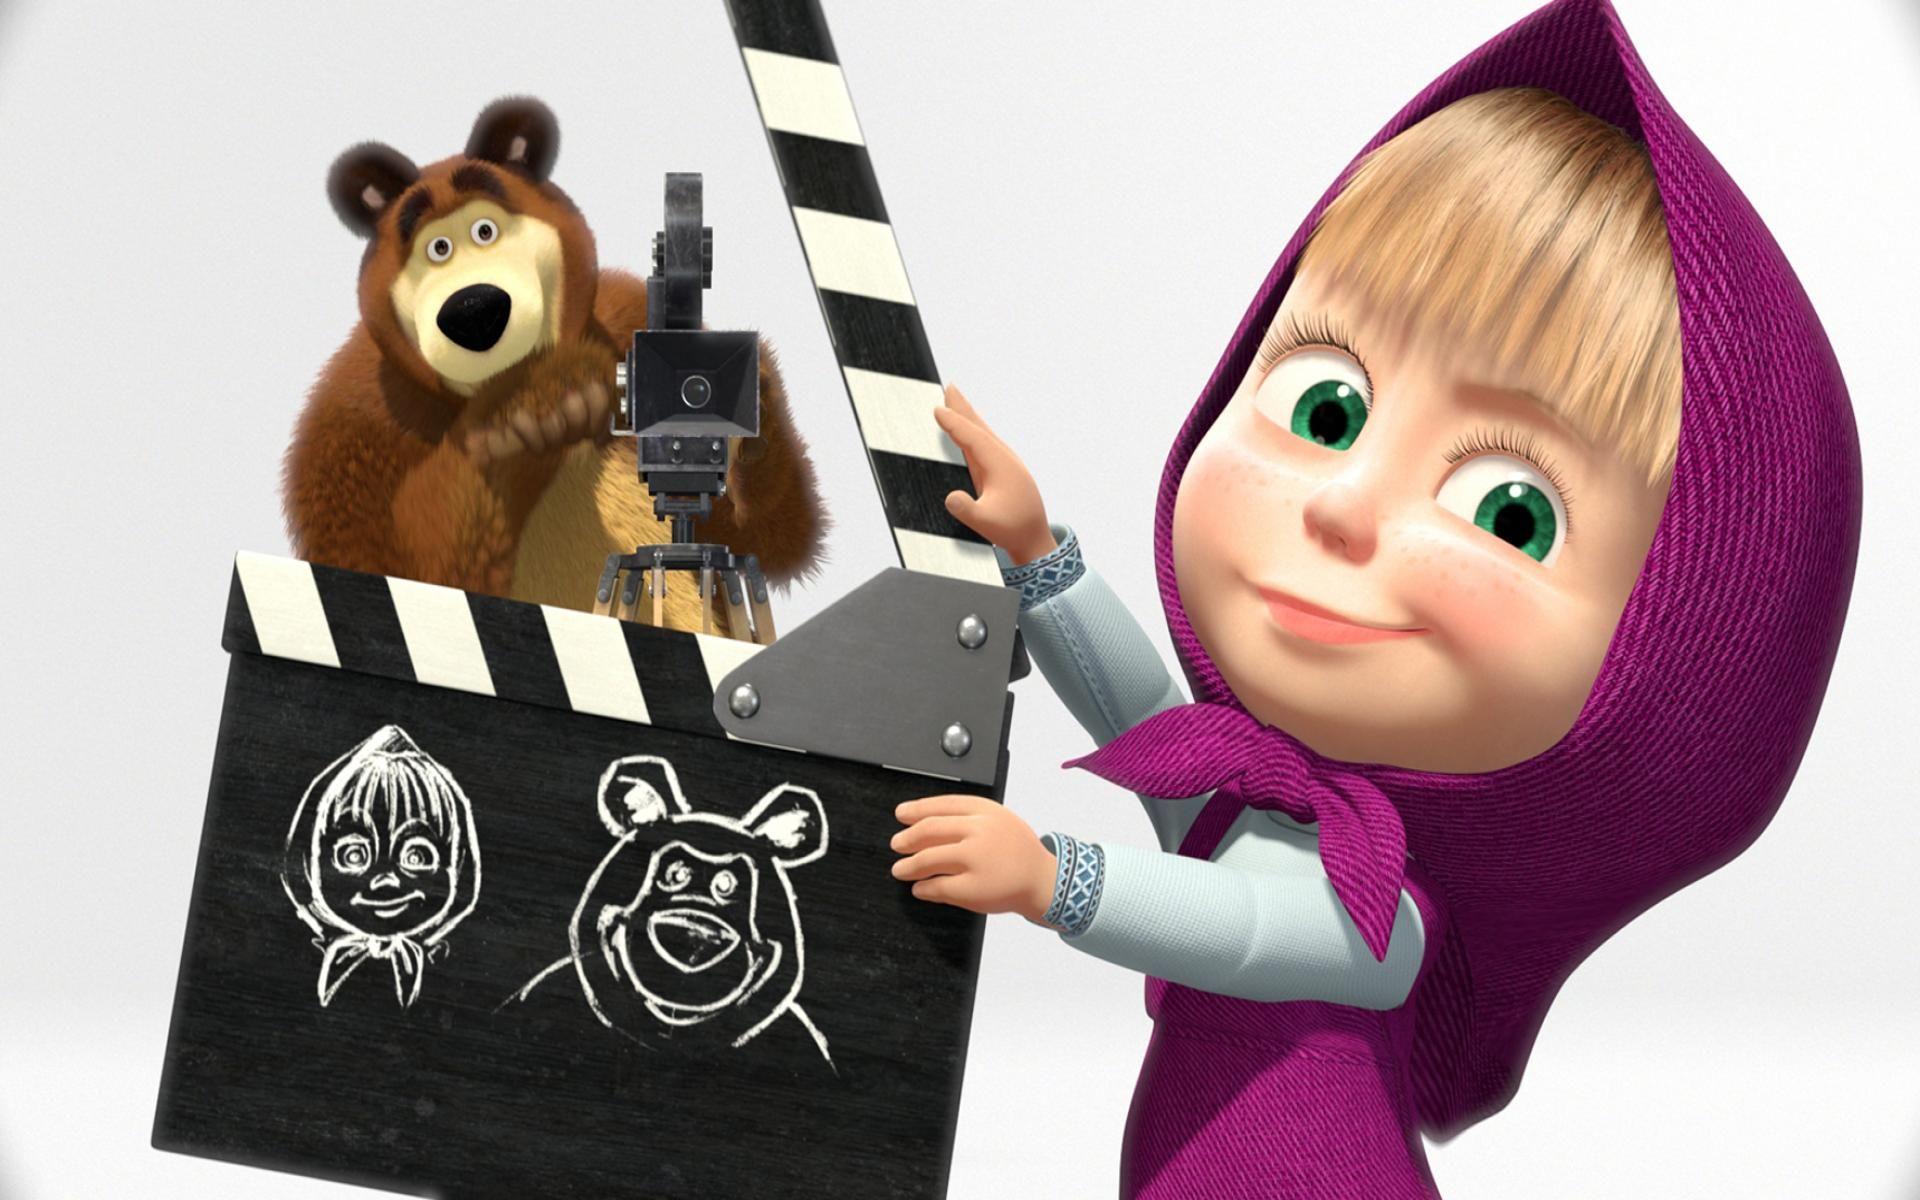 Logo Masha Eo Urso Pesquisa Google Masha E O Urso Marsha E O Urso Marcha E O Urso